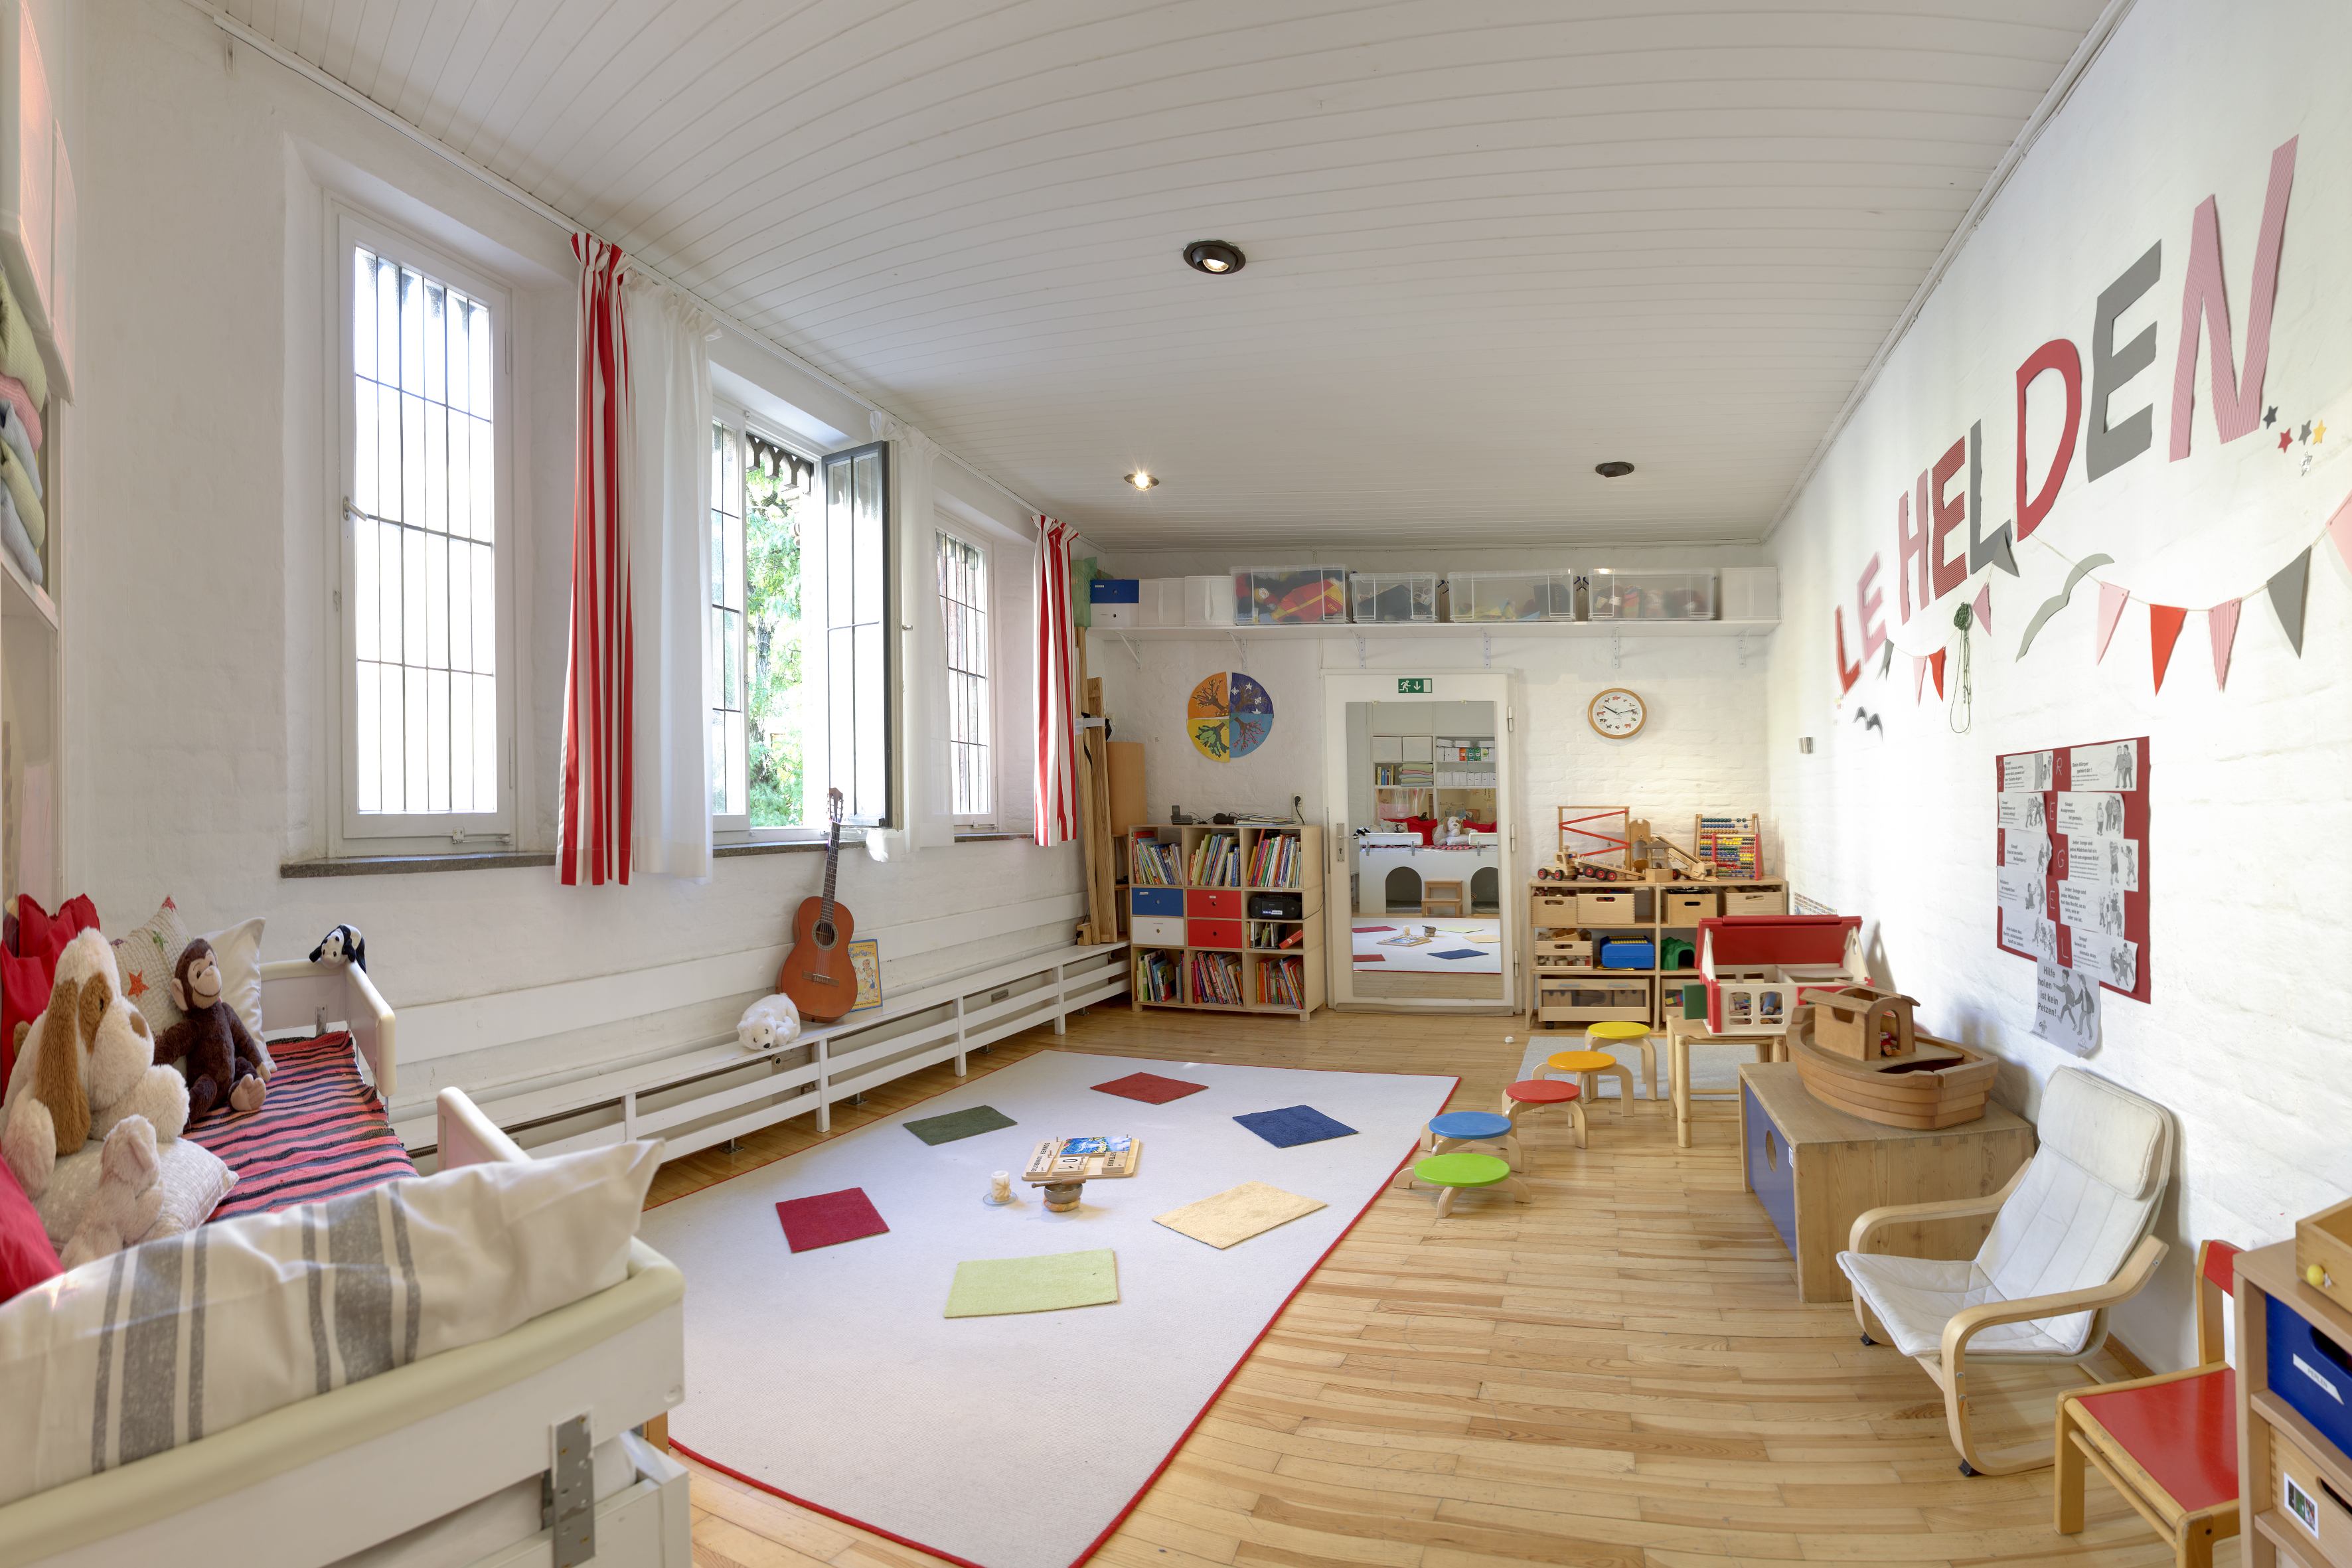 lehelden e v kindergarten im lehel m nchen hier finden sie alle infos zu den lehelden. Black Bedroom Furniture Sets. Home Design Ideas